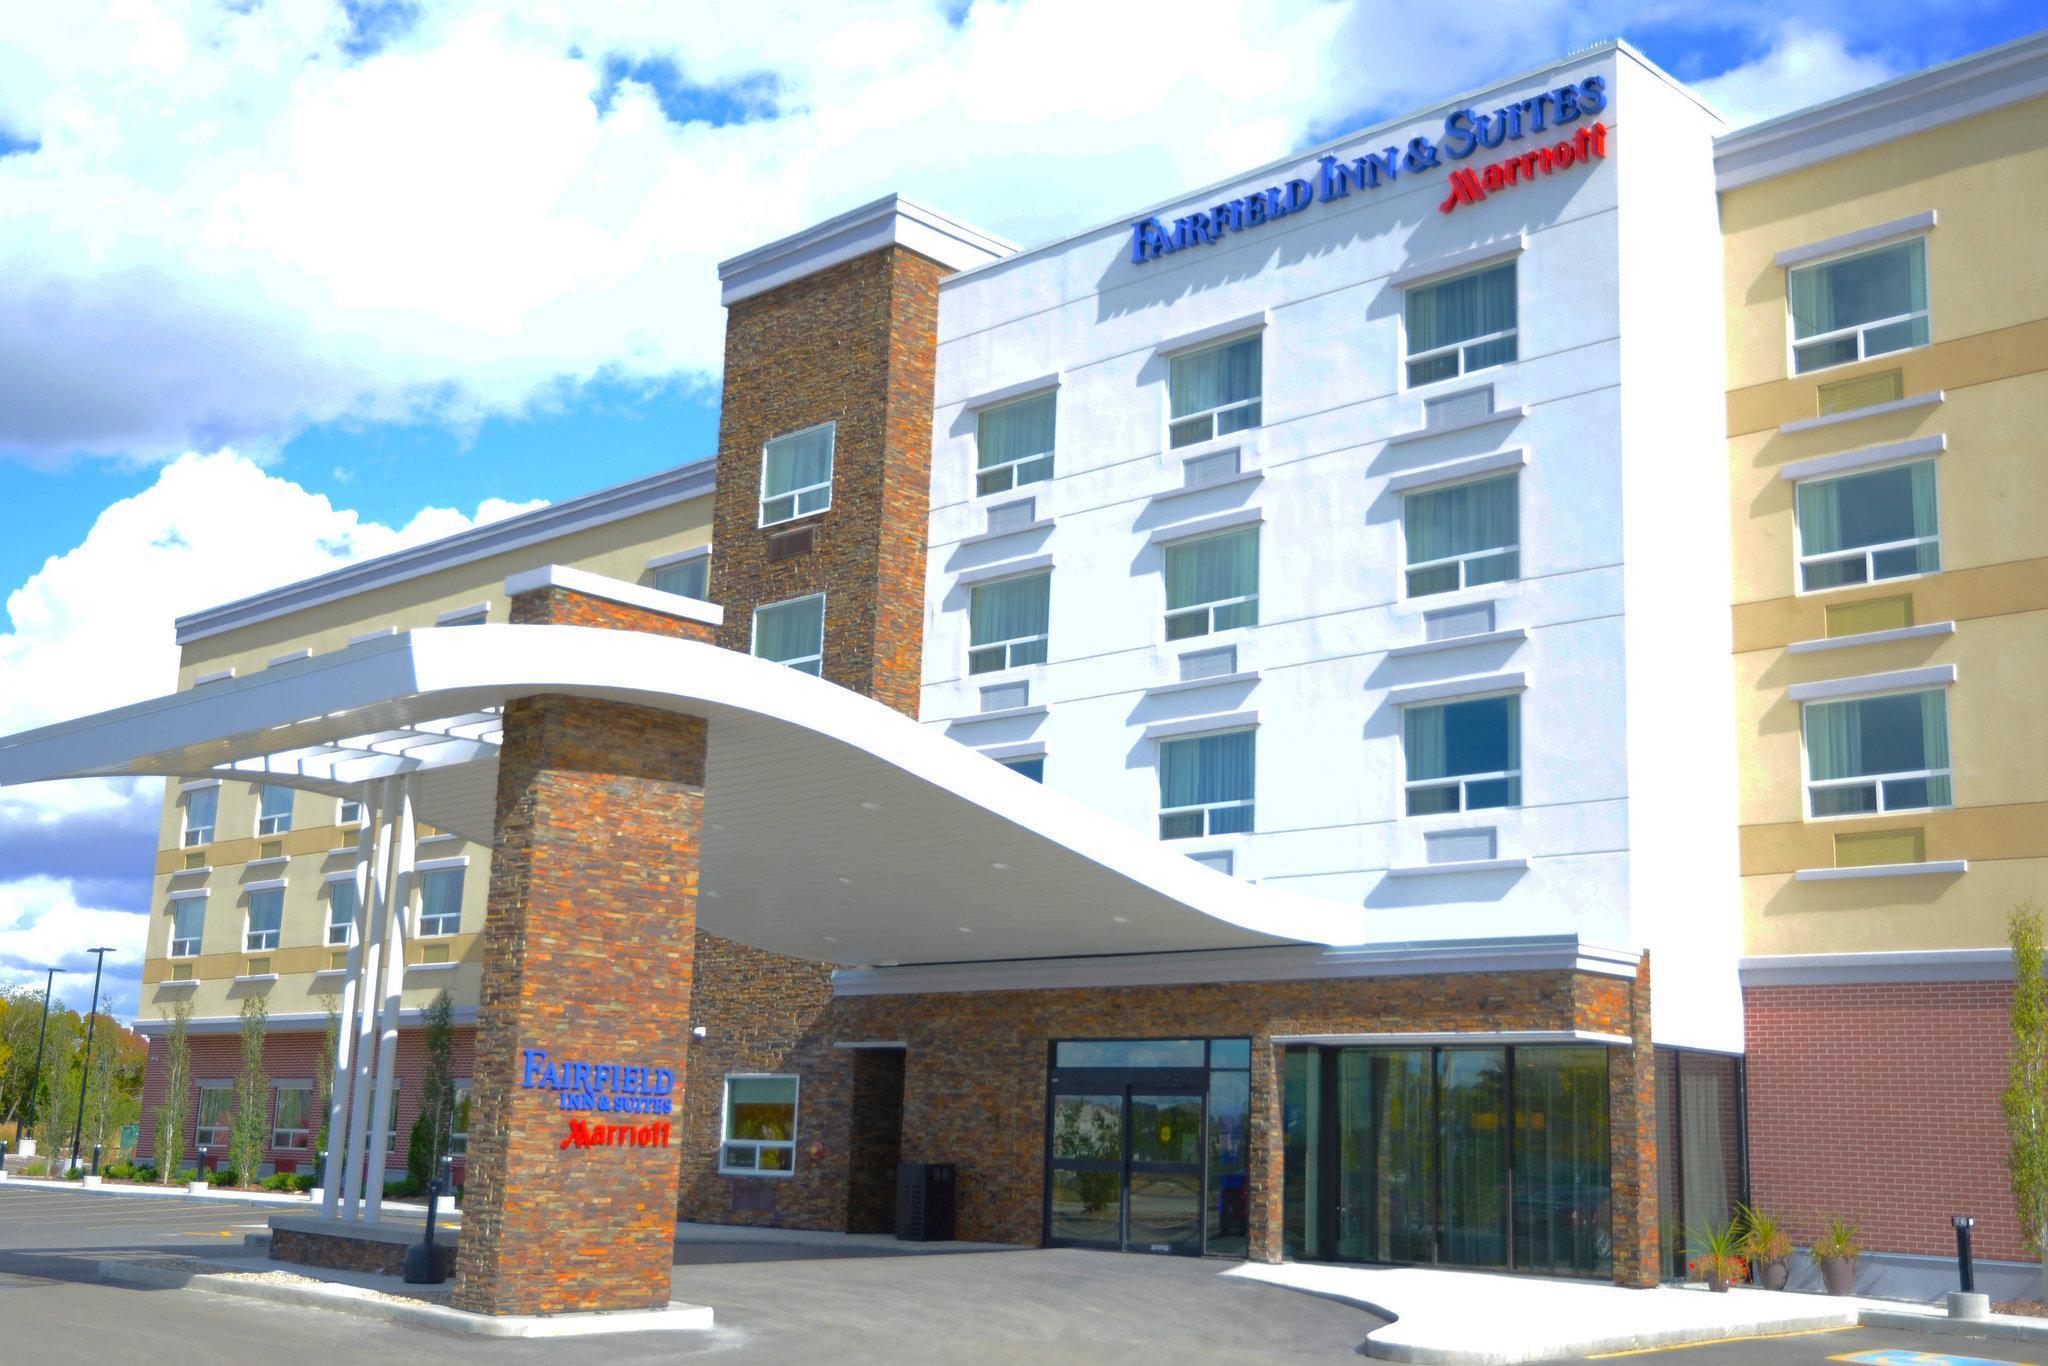 Fairfield Inn And Suites By Marriott Edmonton North